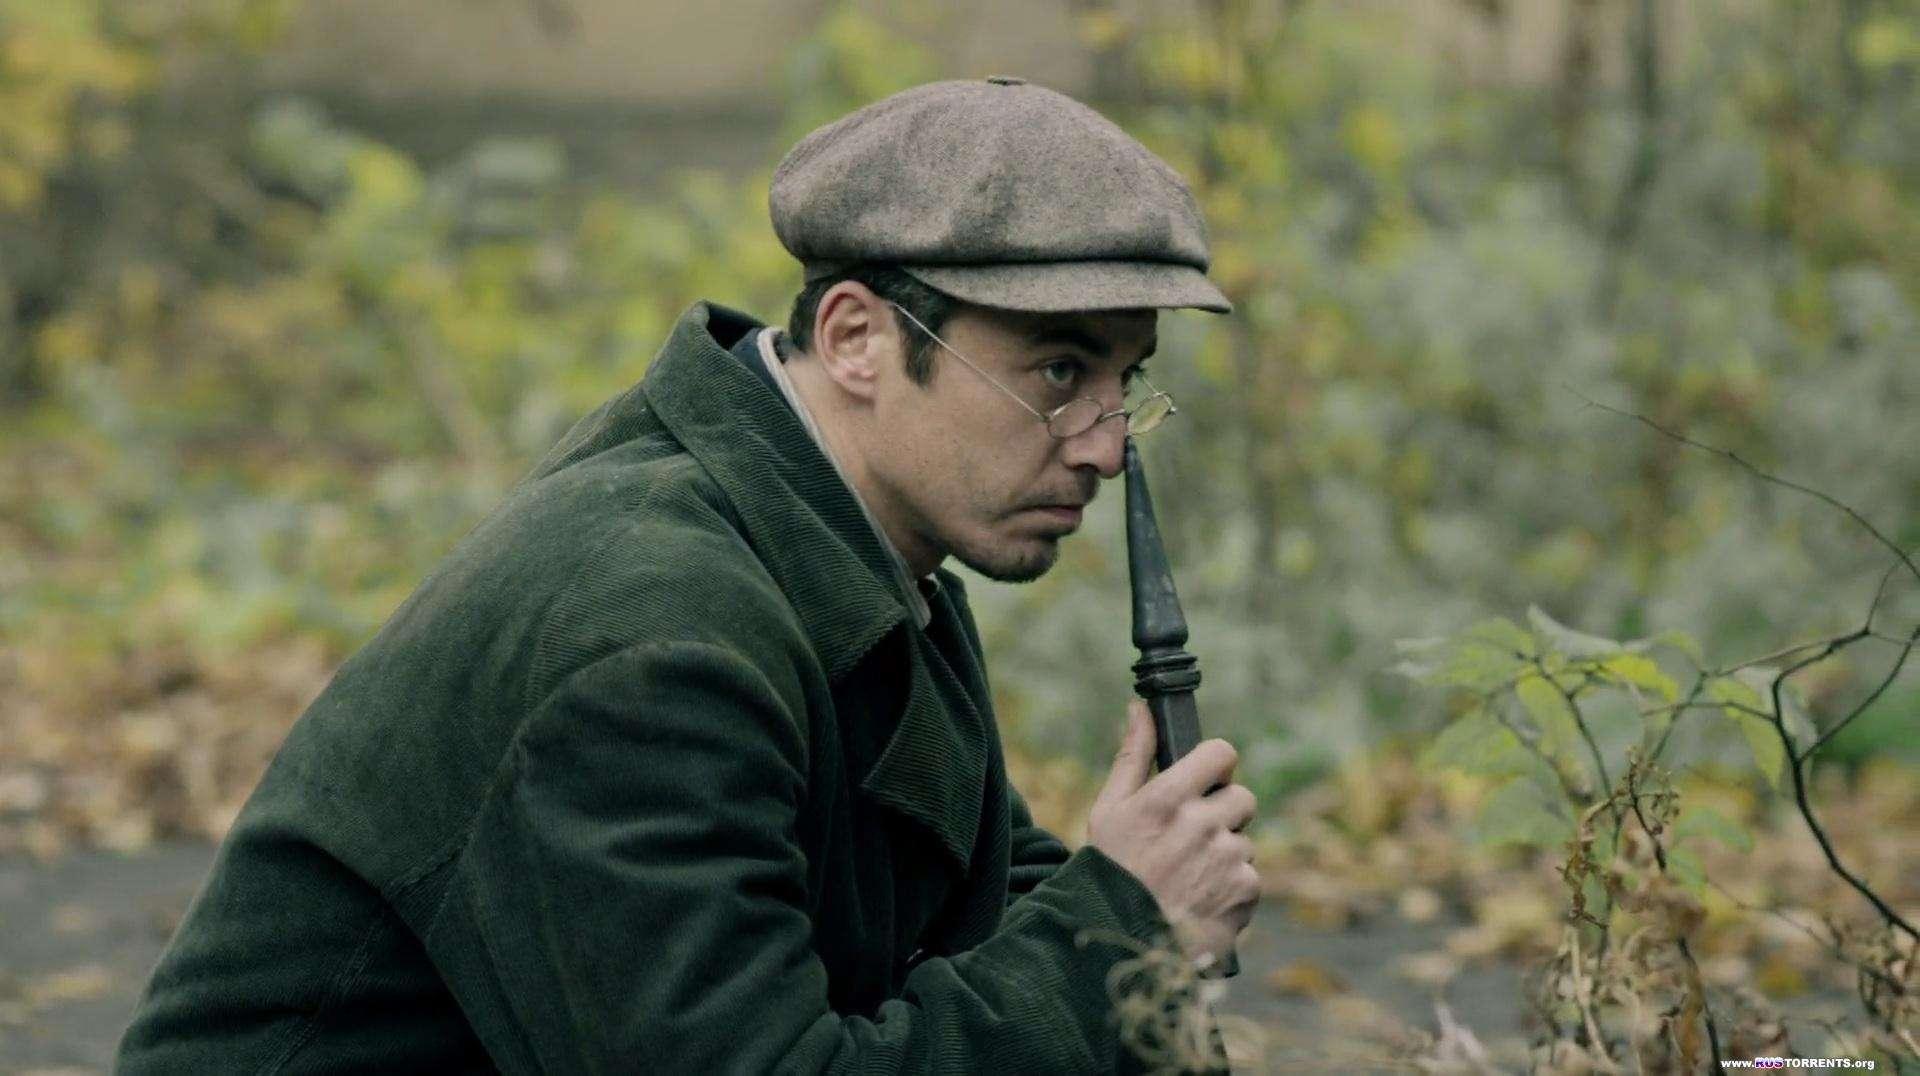 Шерлок Холмс [01-08 из 08] | WEB-DL 1080p